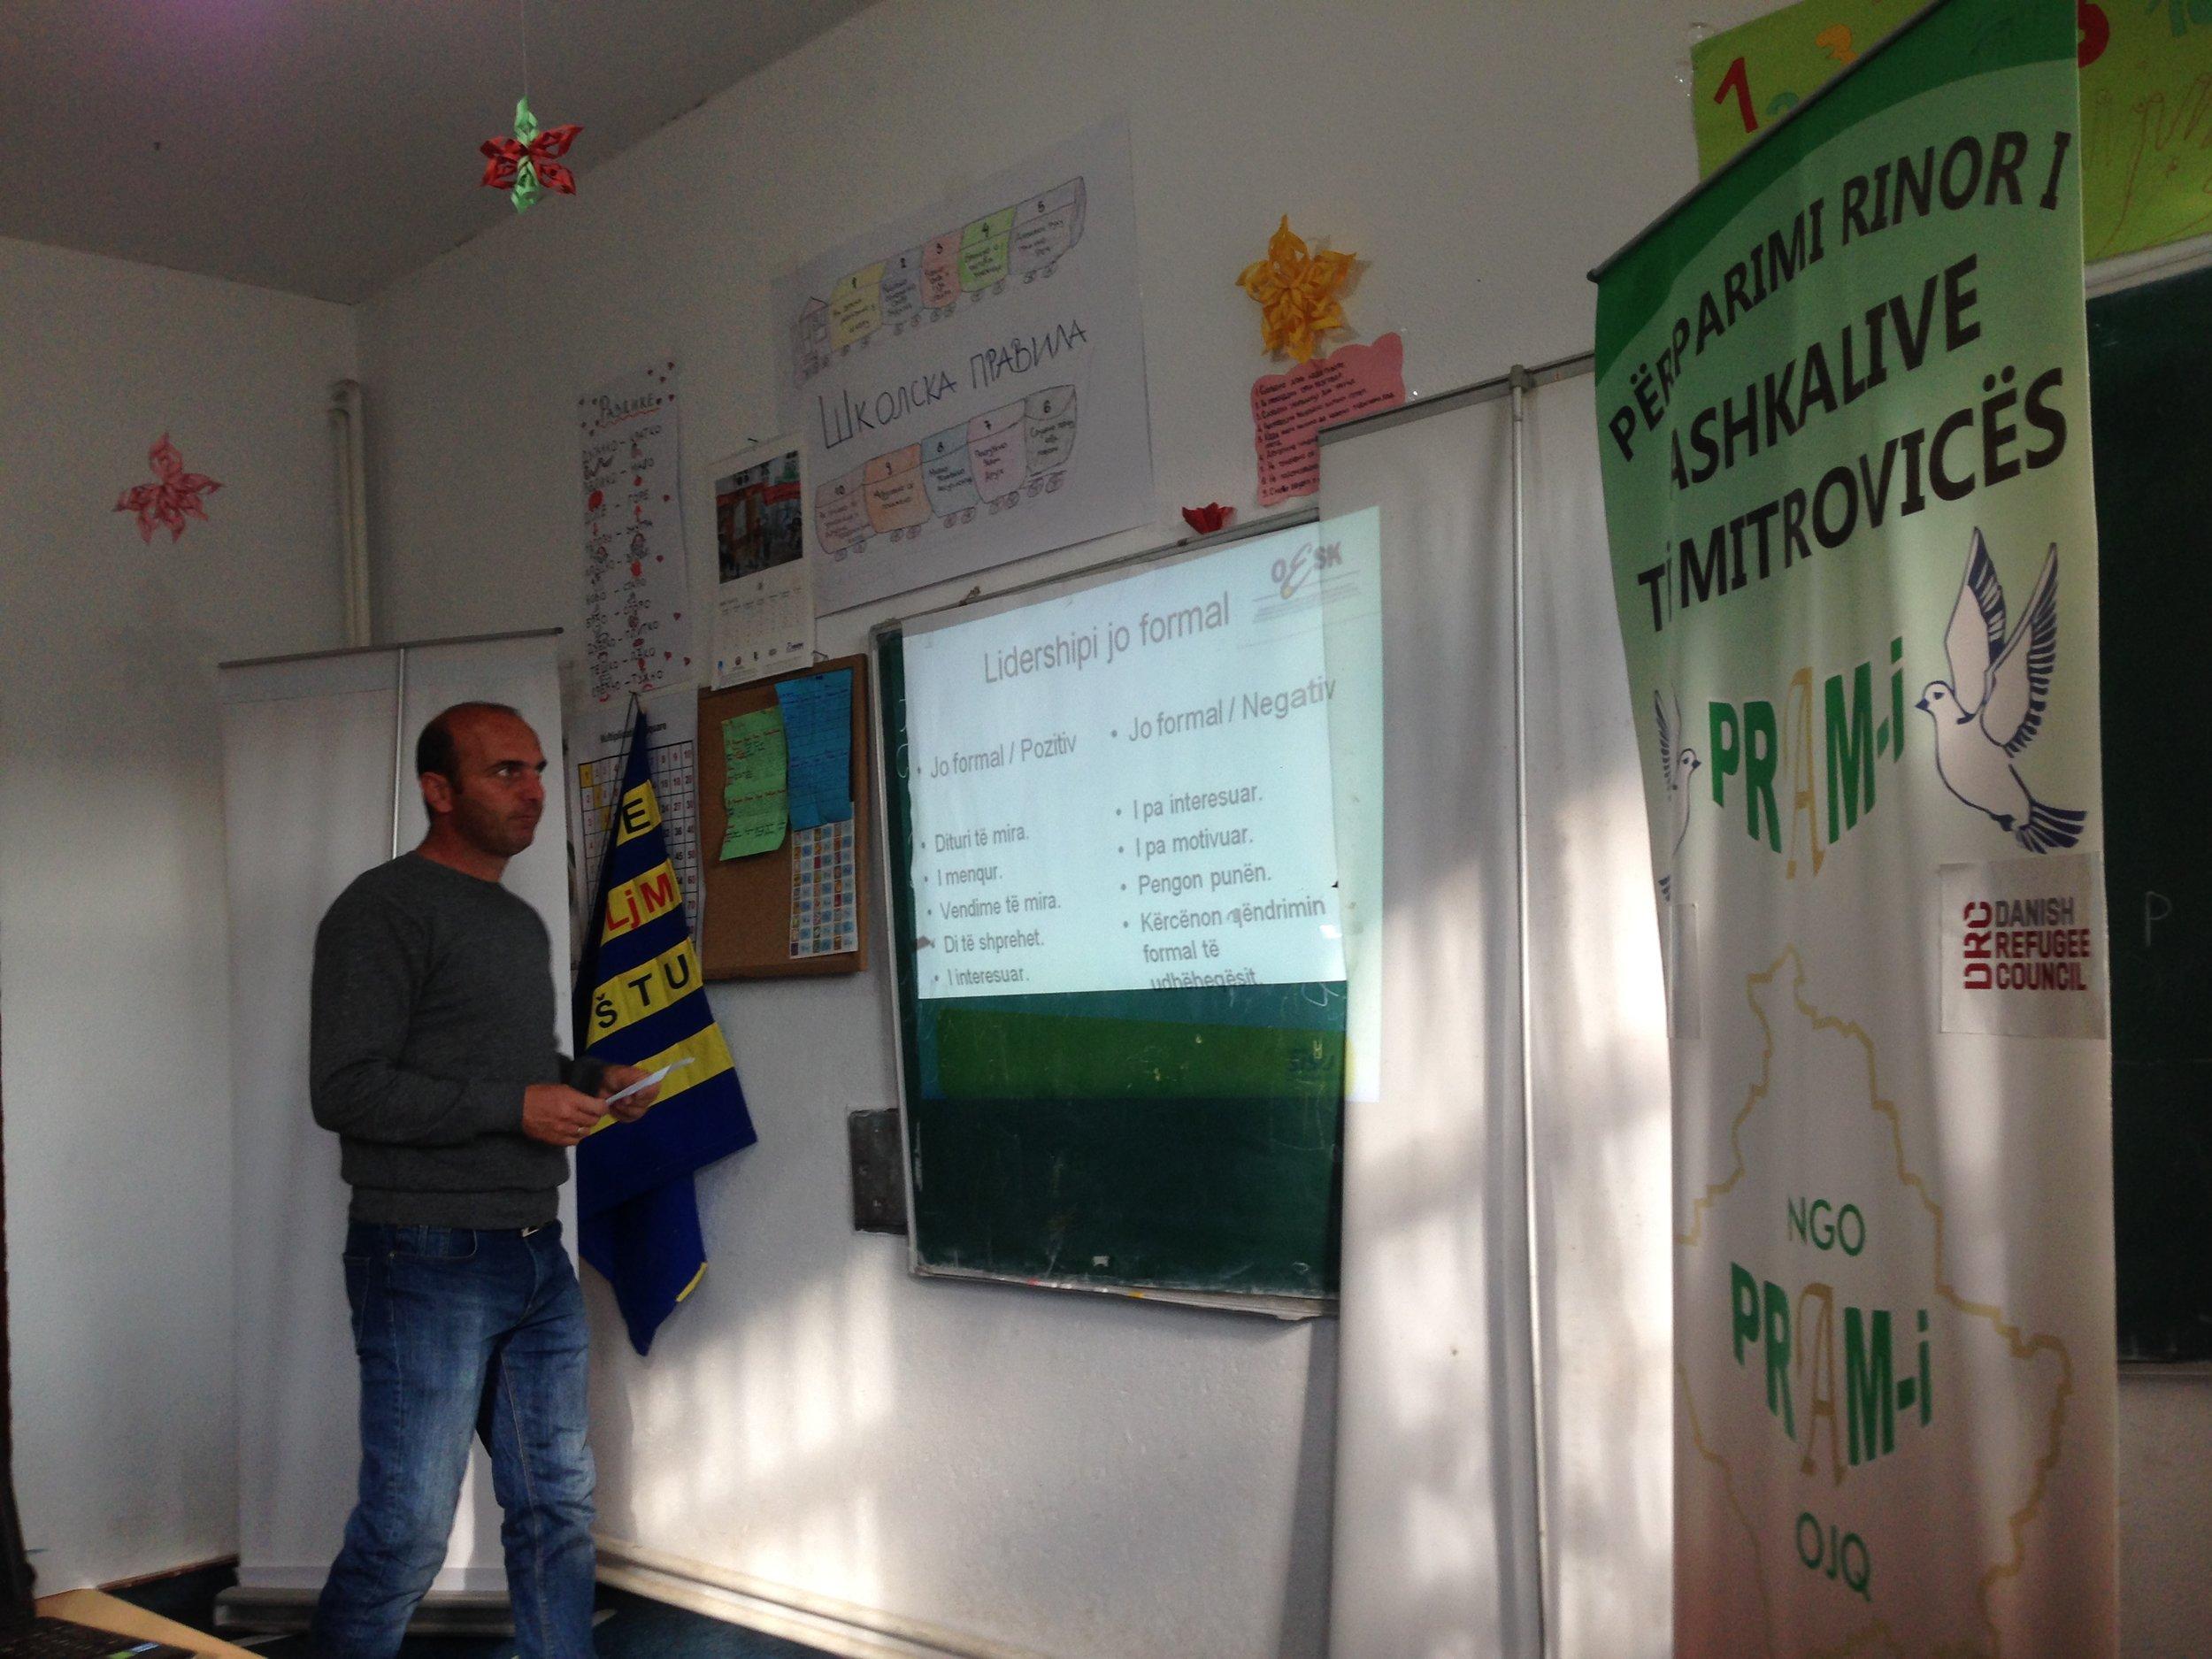 NGO PRAM Leadership trainings 1.JPG